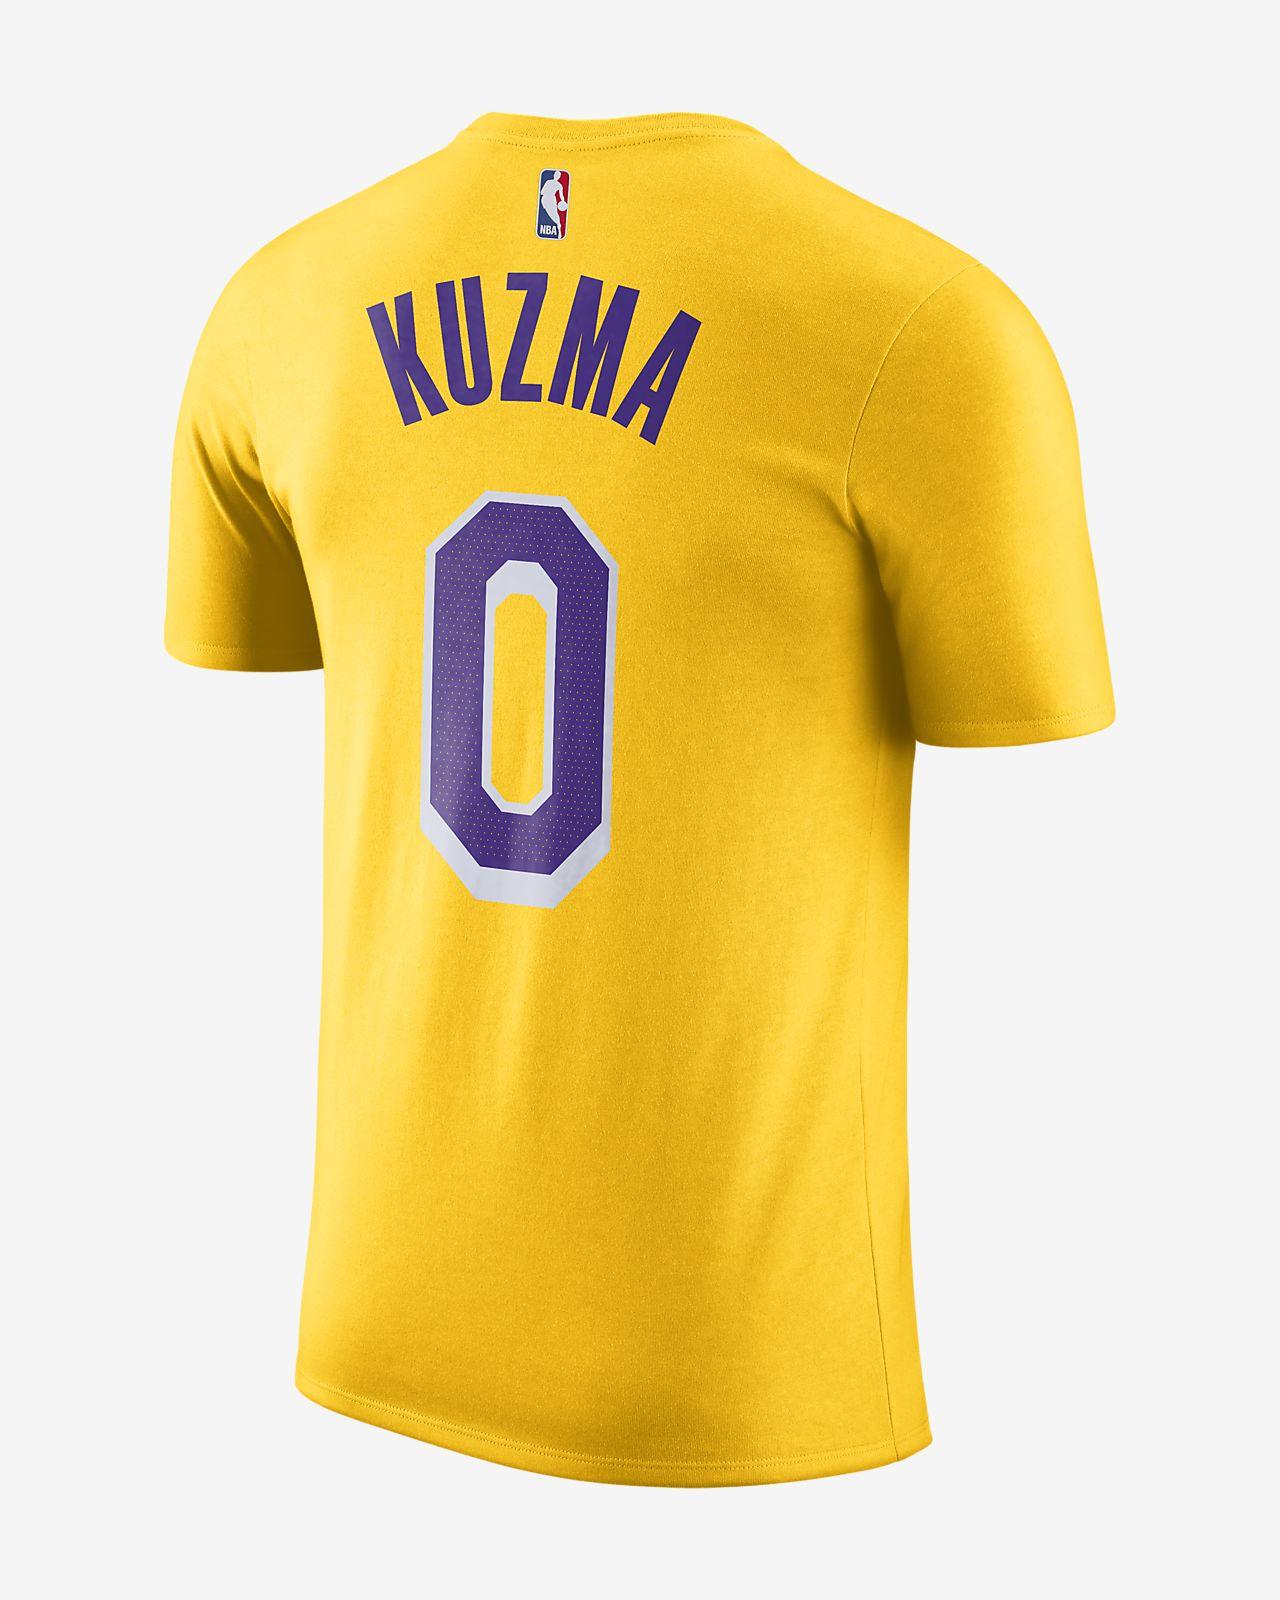 new products 76274 98b3a Kyle Kuzma Los Angeles Lakers Nike Dri-FIT Men's NBA T-Shirt